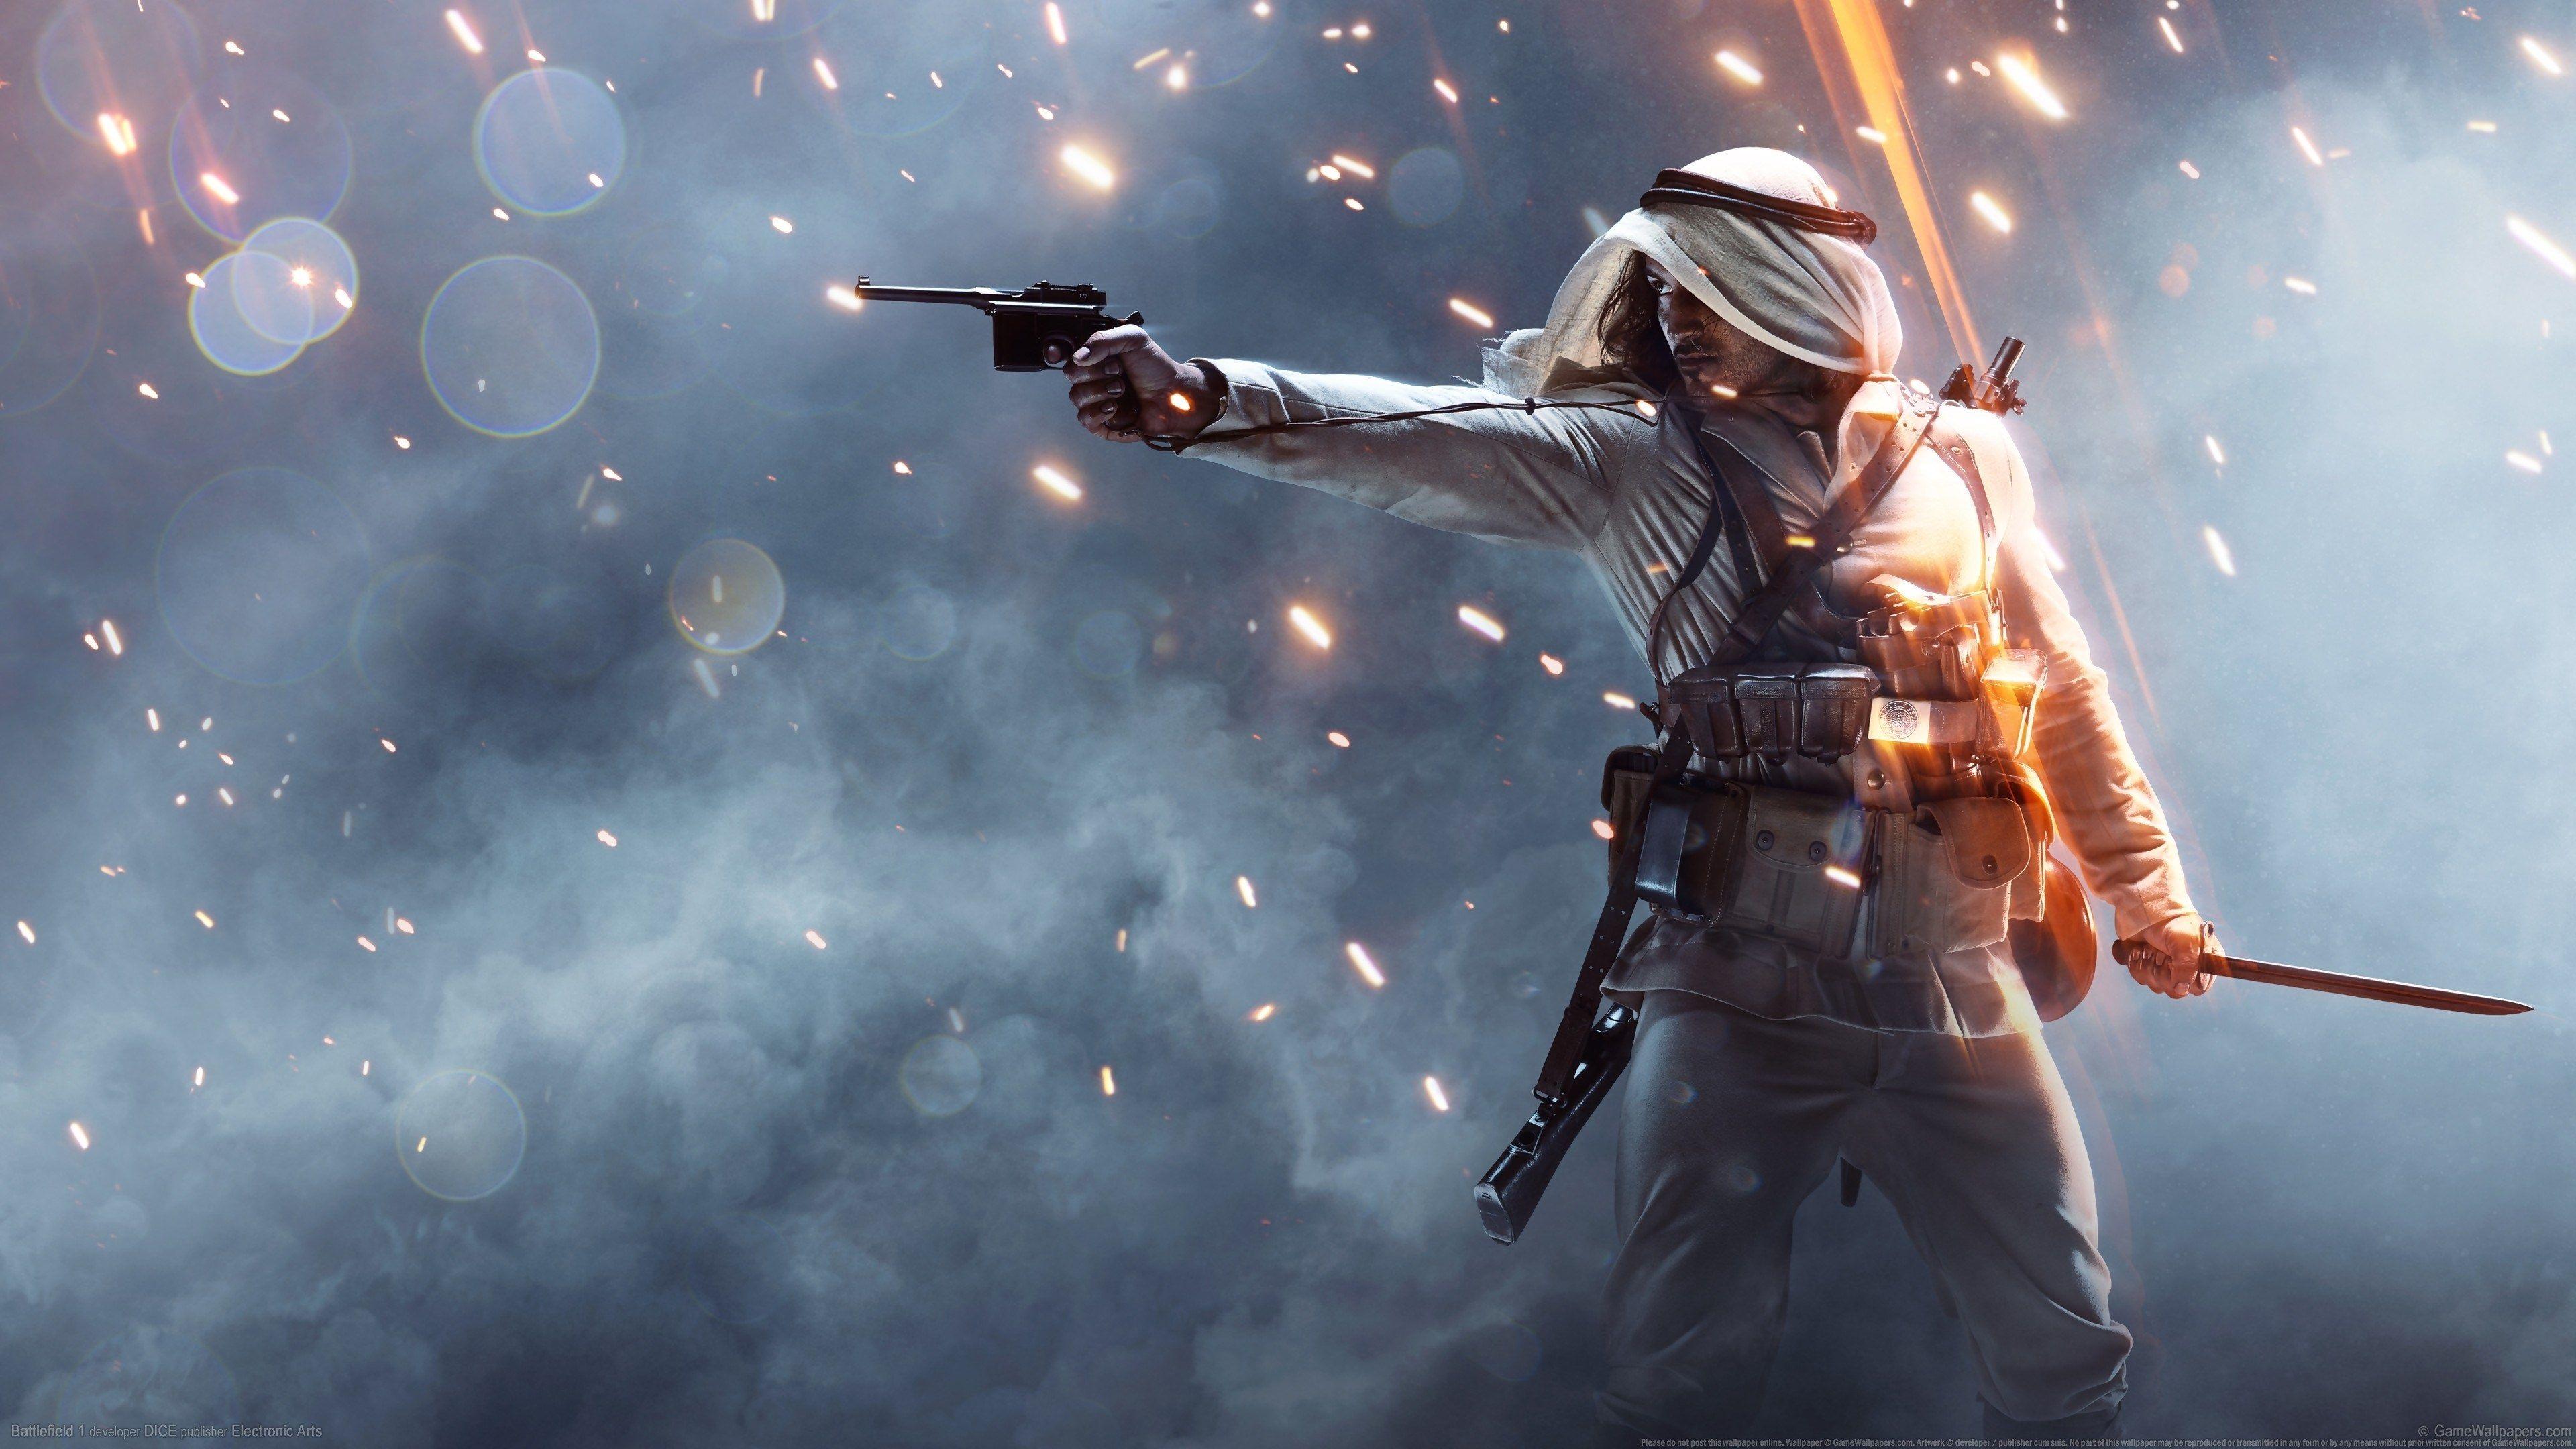 3840x2160 Battlefield 1 Revolution 4k Background Free Battlefield 1 Papeis De Parede De Jogos Campo De Batalha